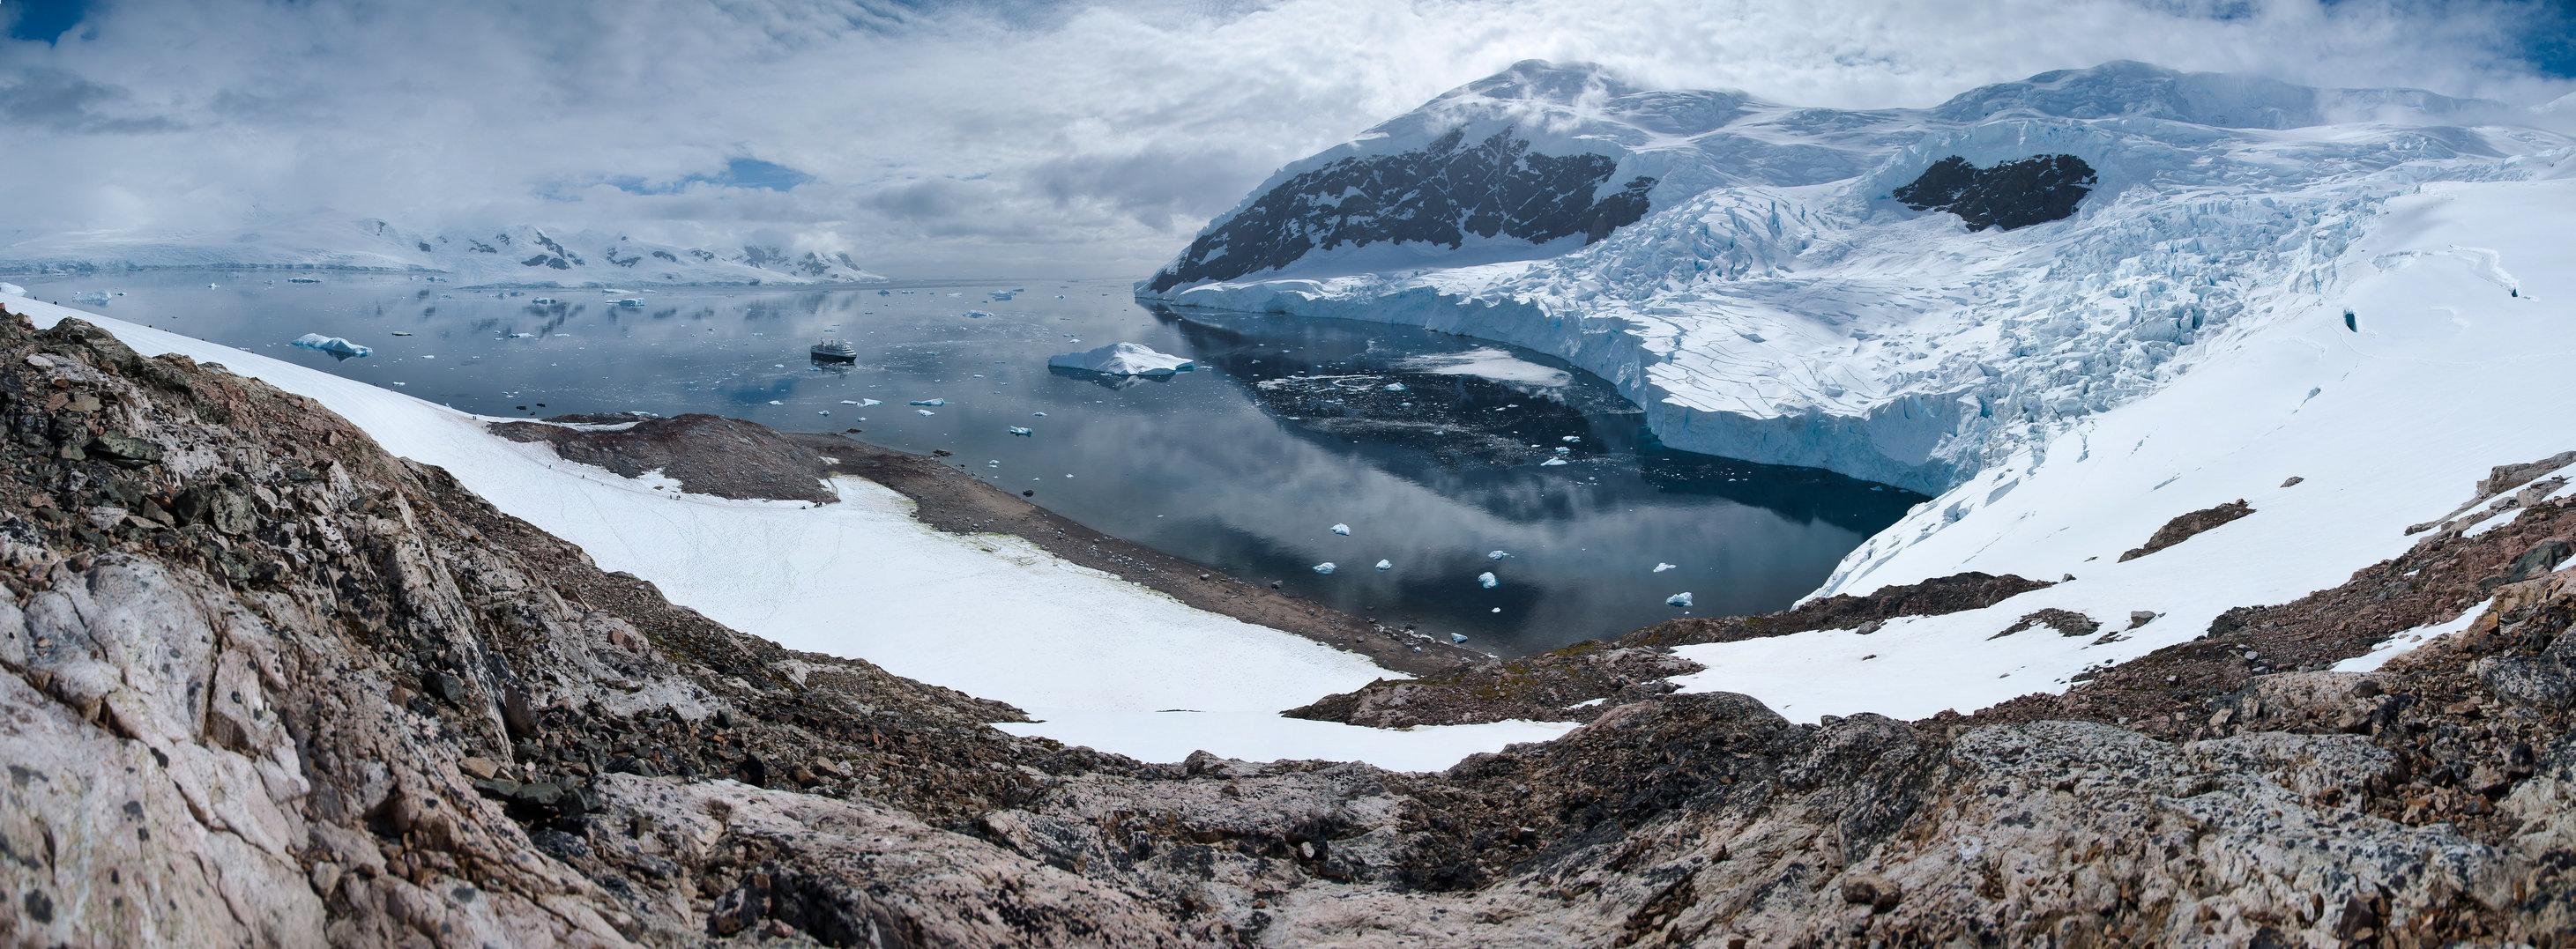 Panorama-Neko Harbour, Antarctica.jpg